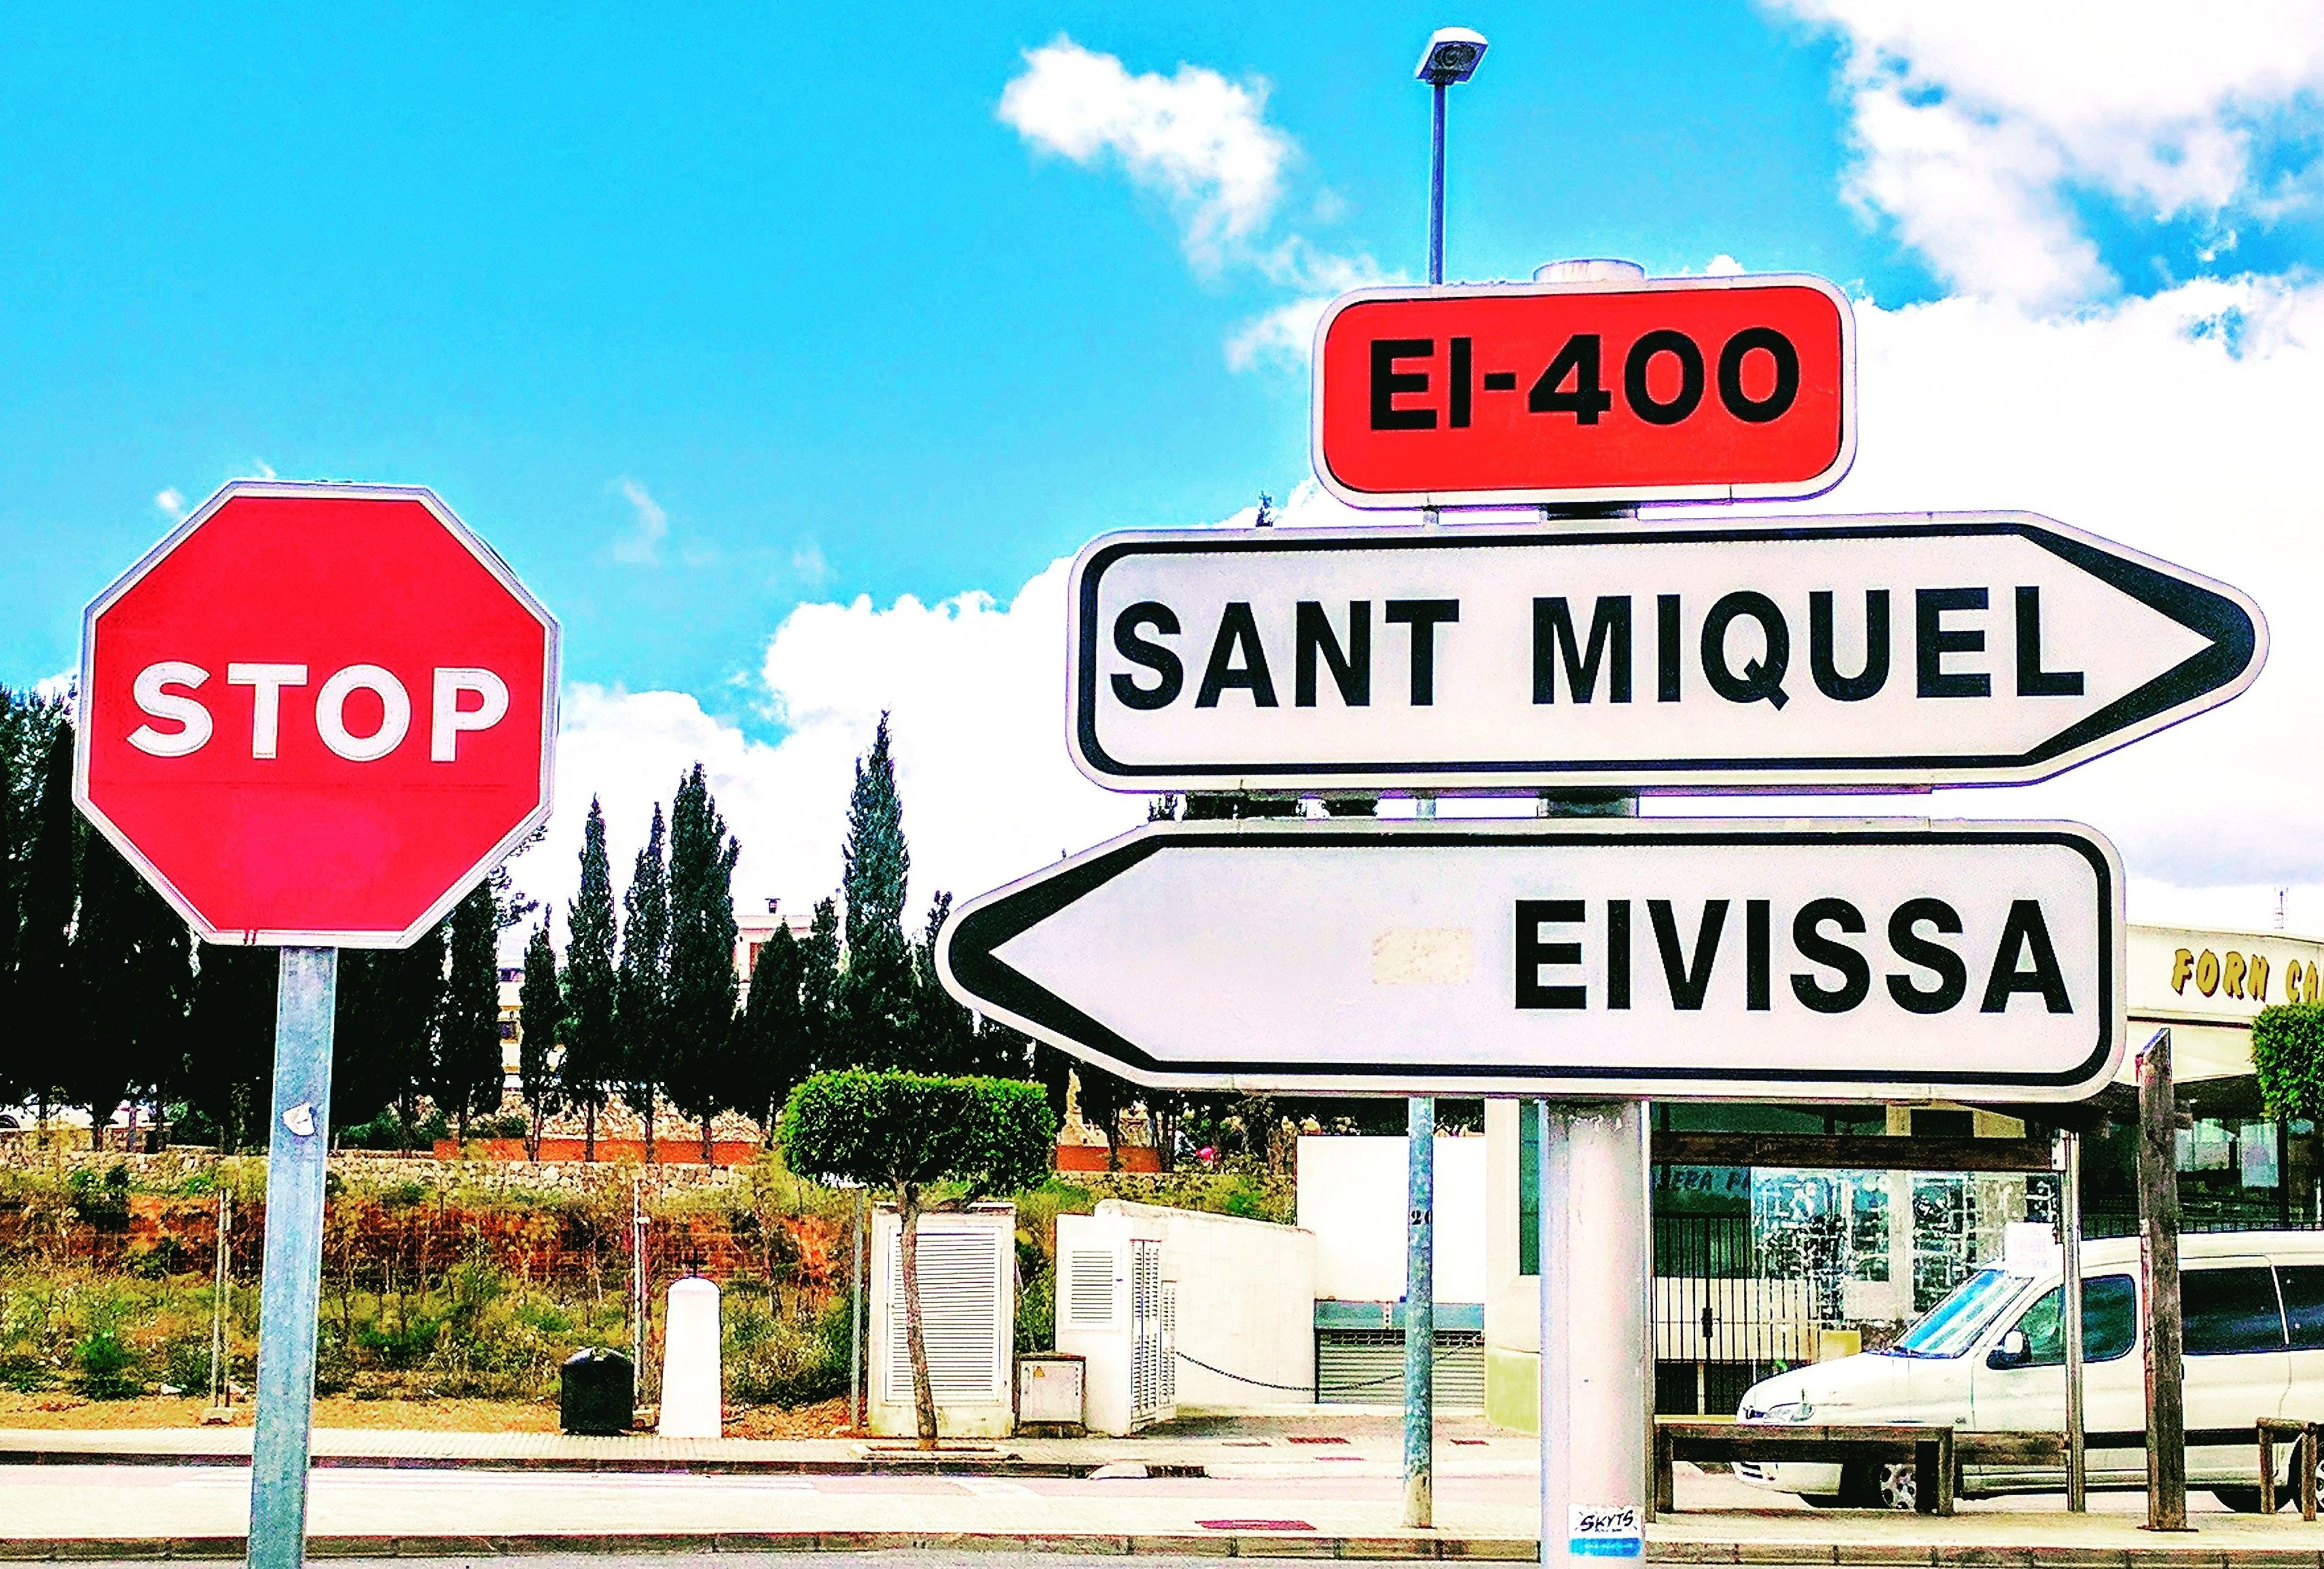 Foto 24 de Abogados en Eivissa   Raad Abogados. Tel 691 270 993